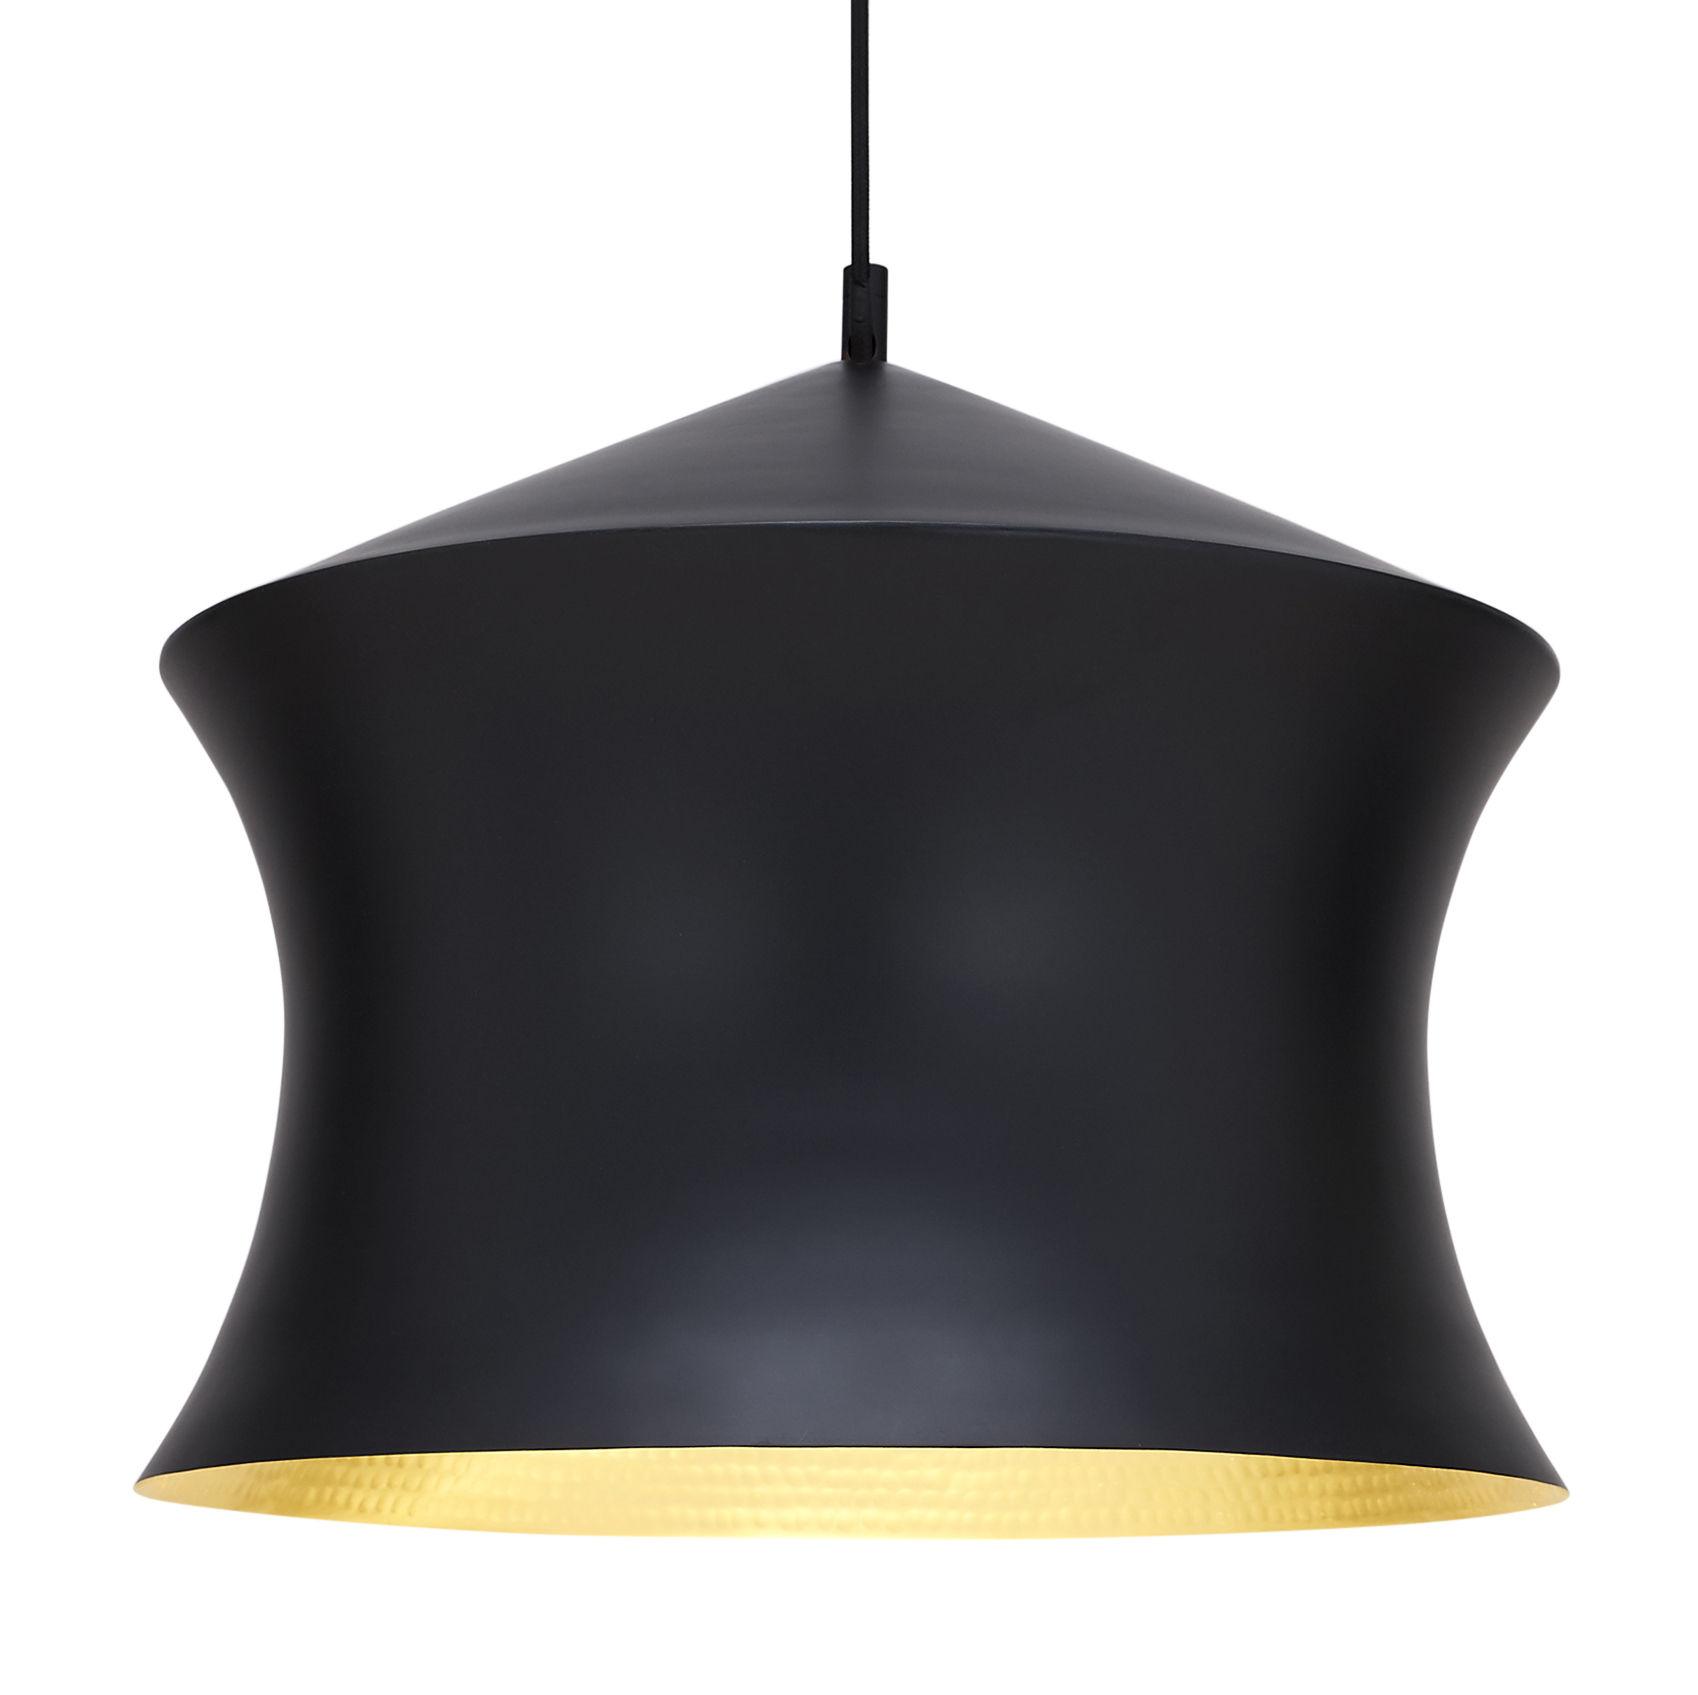 Lighting - Pendant Lighting - Beat Waist Pendant - Ø 33 x H 41 cm by Tom Dixon - Black / gold - Brass